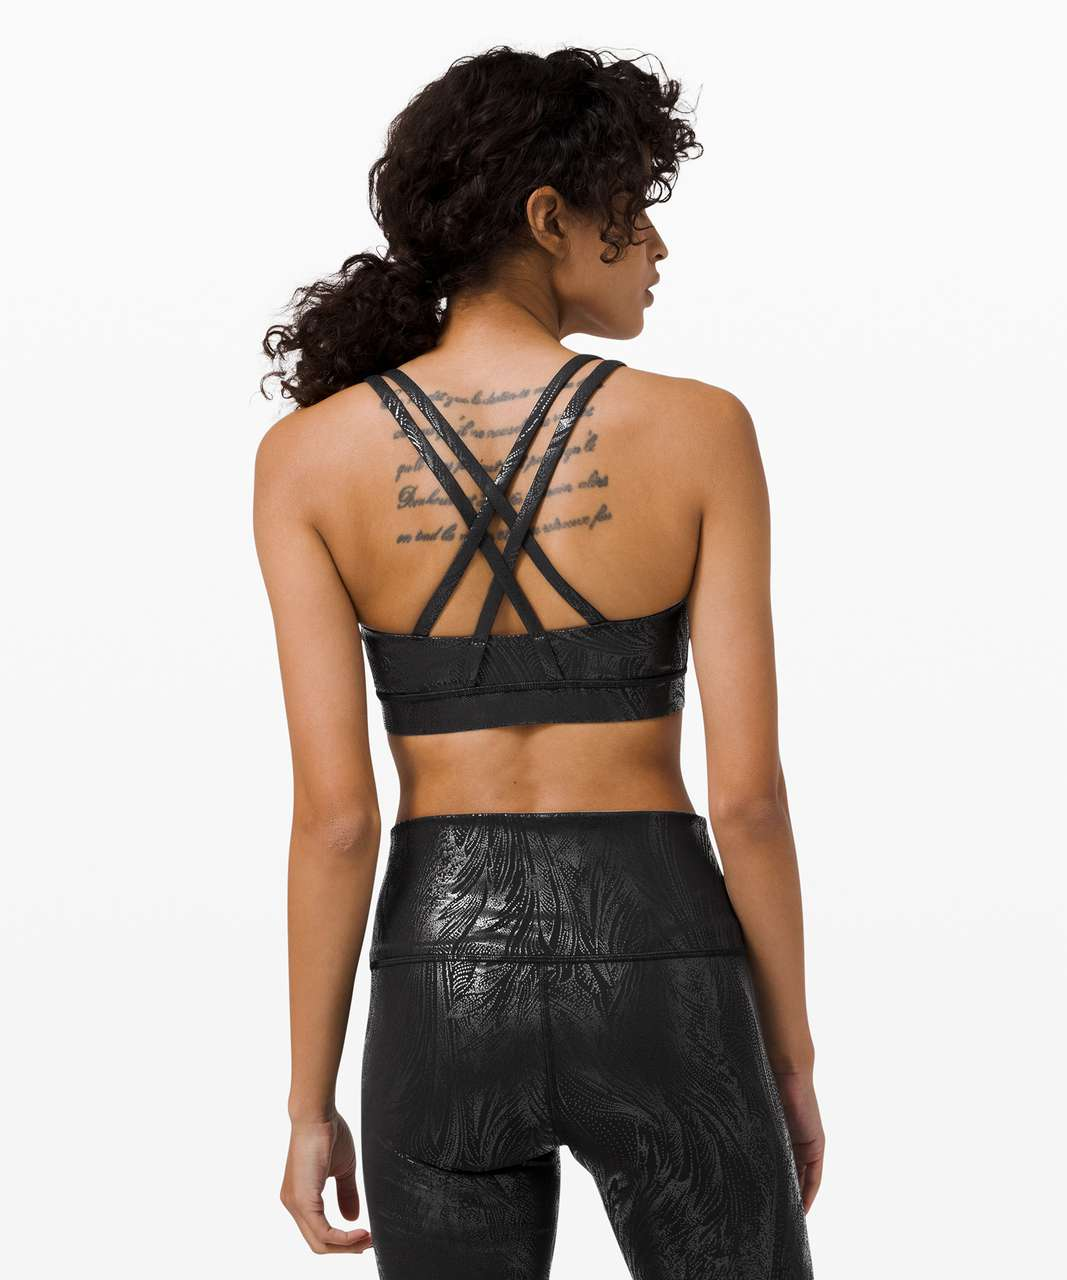 Lululemon Energy Bra Shine *Medium Support, B–D Cup - Acclimatize Black Black Foil